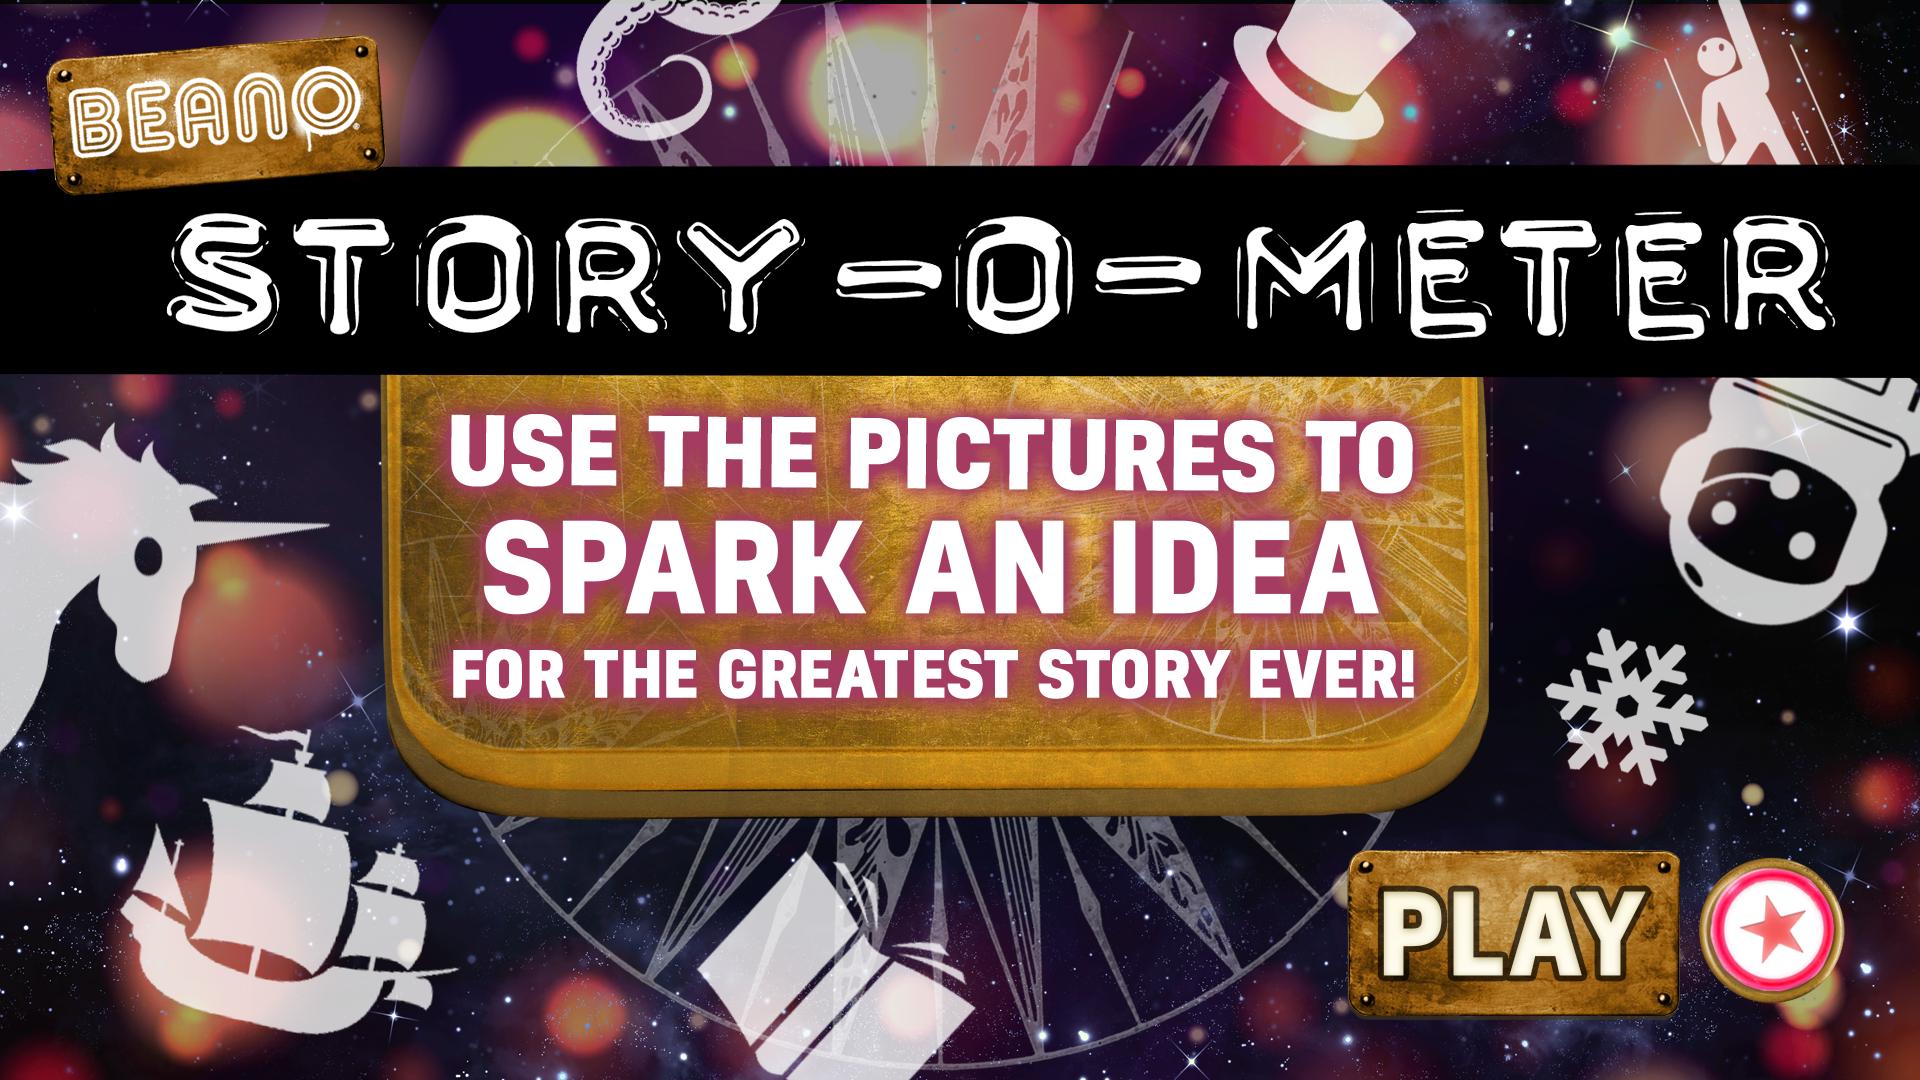 Story-O-Meter | Beano's Random Story Generator!